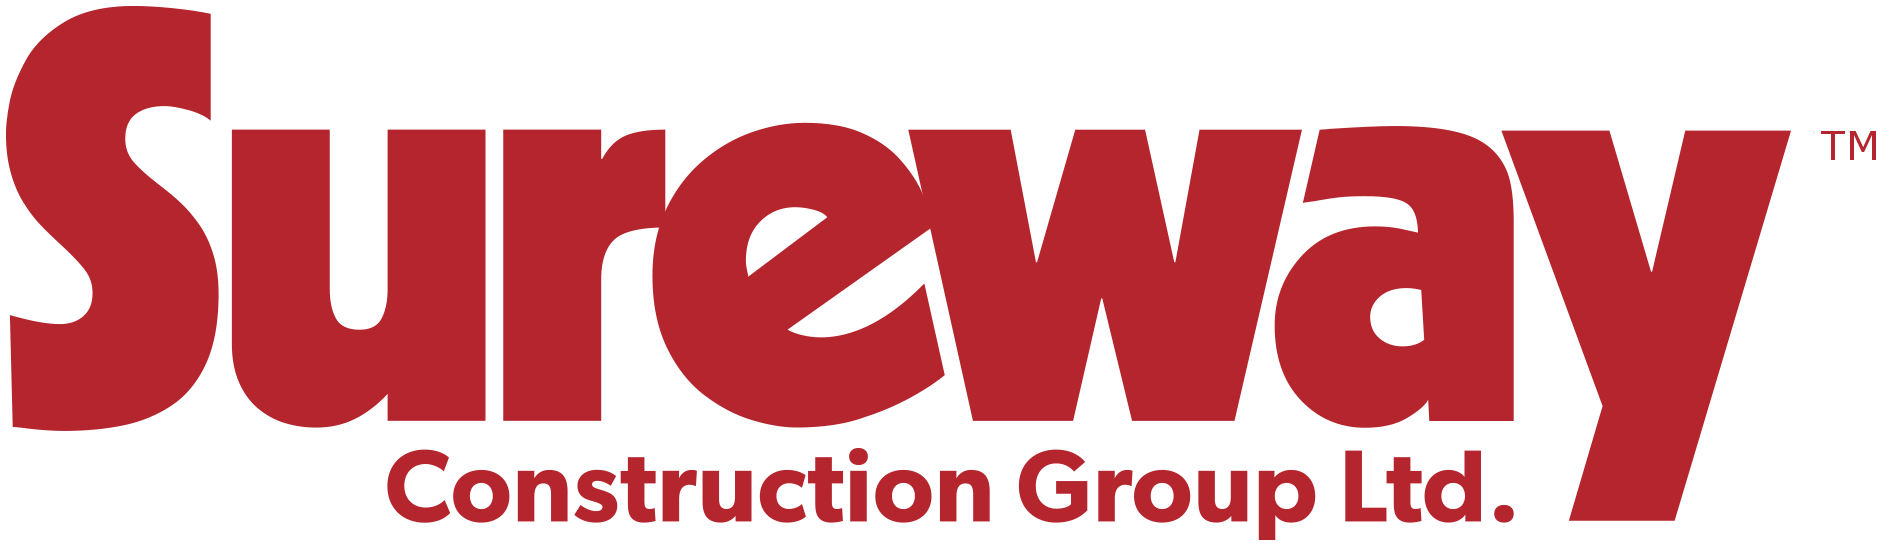 Sureway Construction